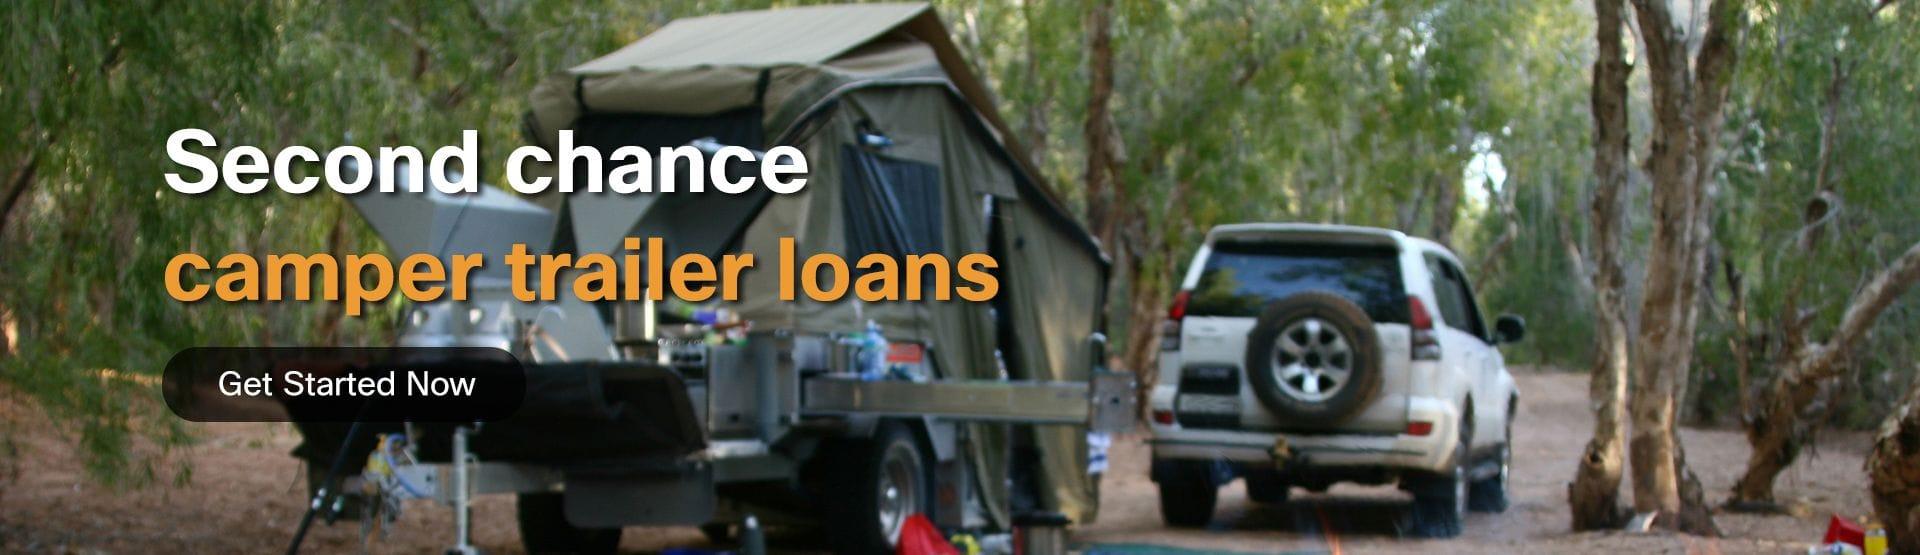 camper trailer loans